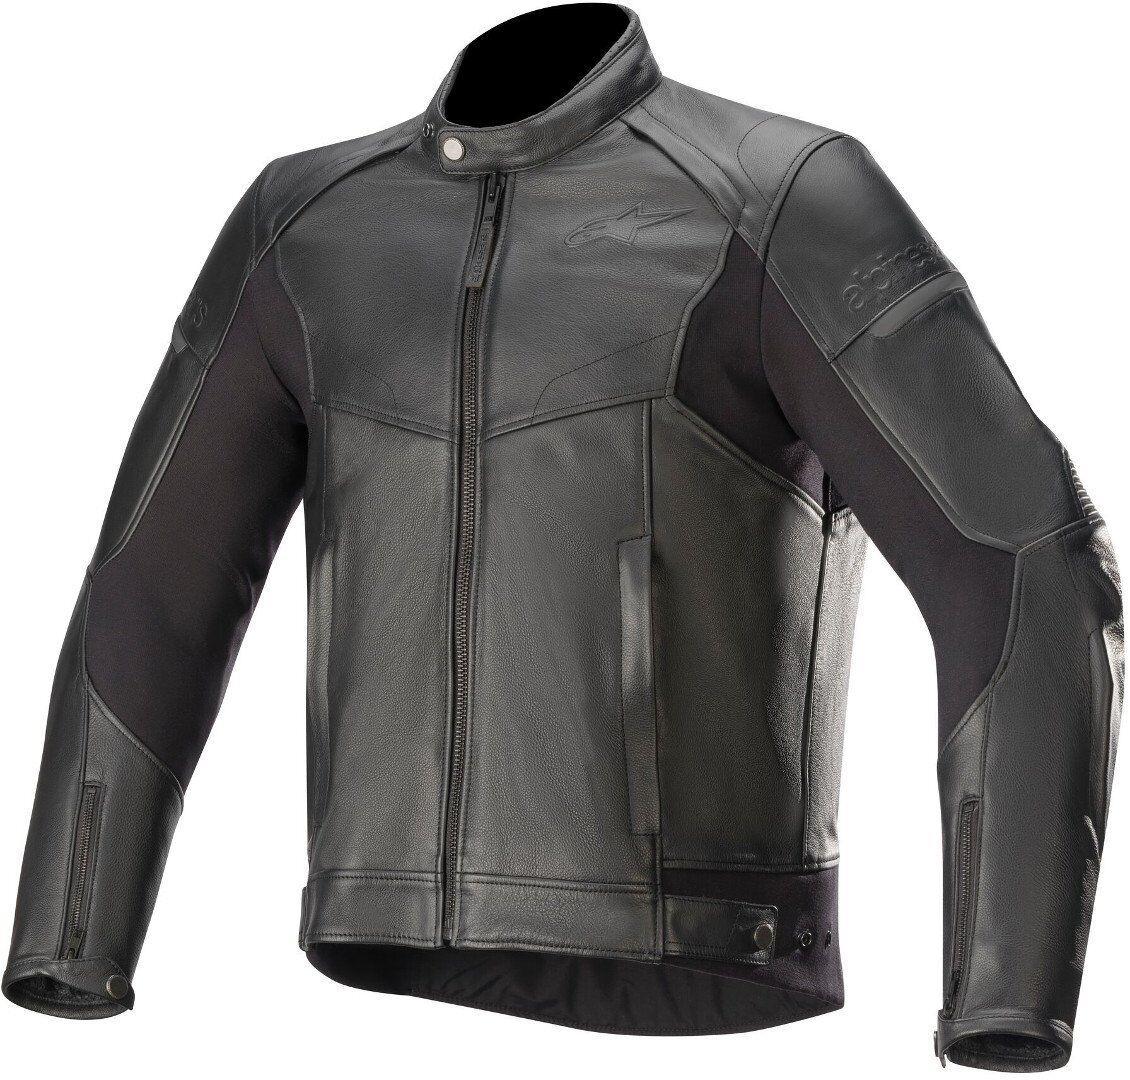 Alpinestars SP-55 Motorcycle Leather Jacket Black 52